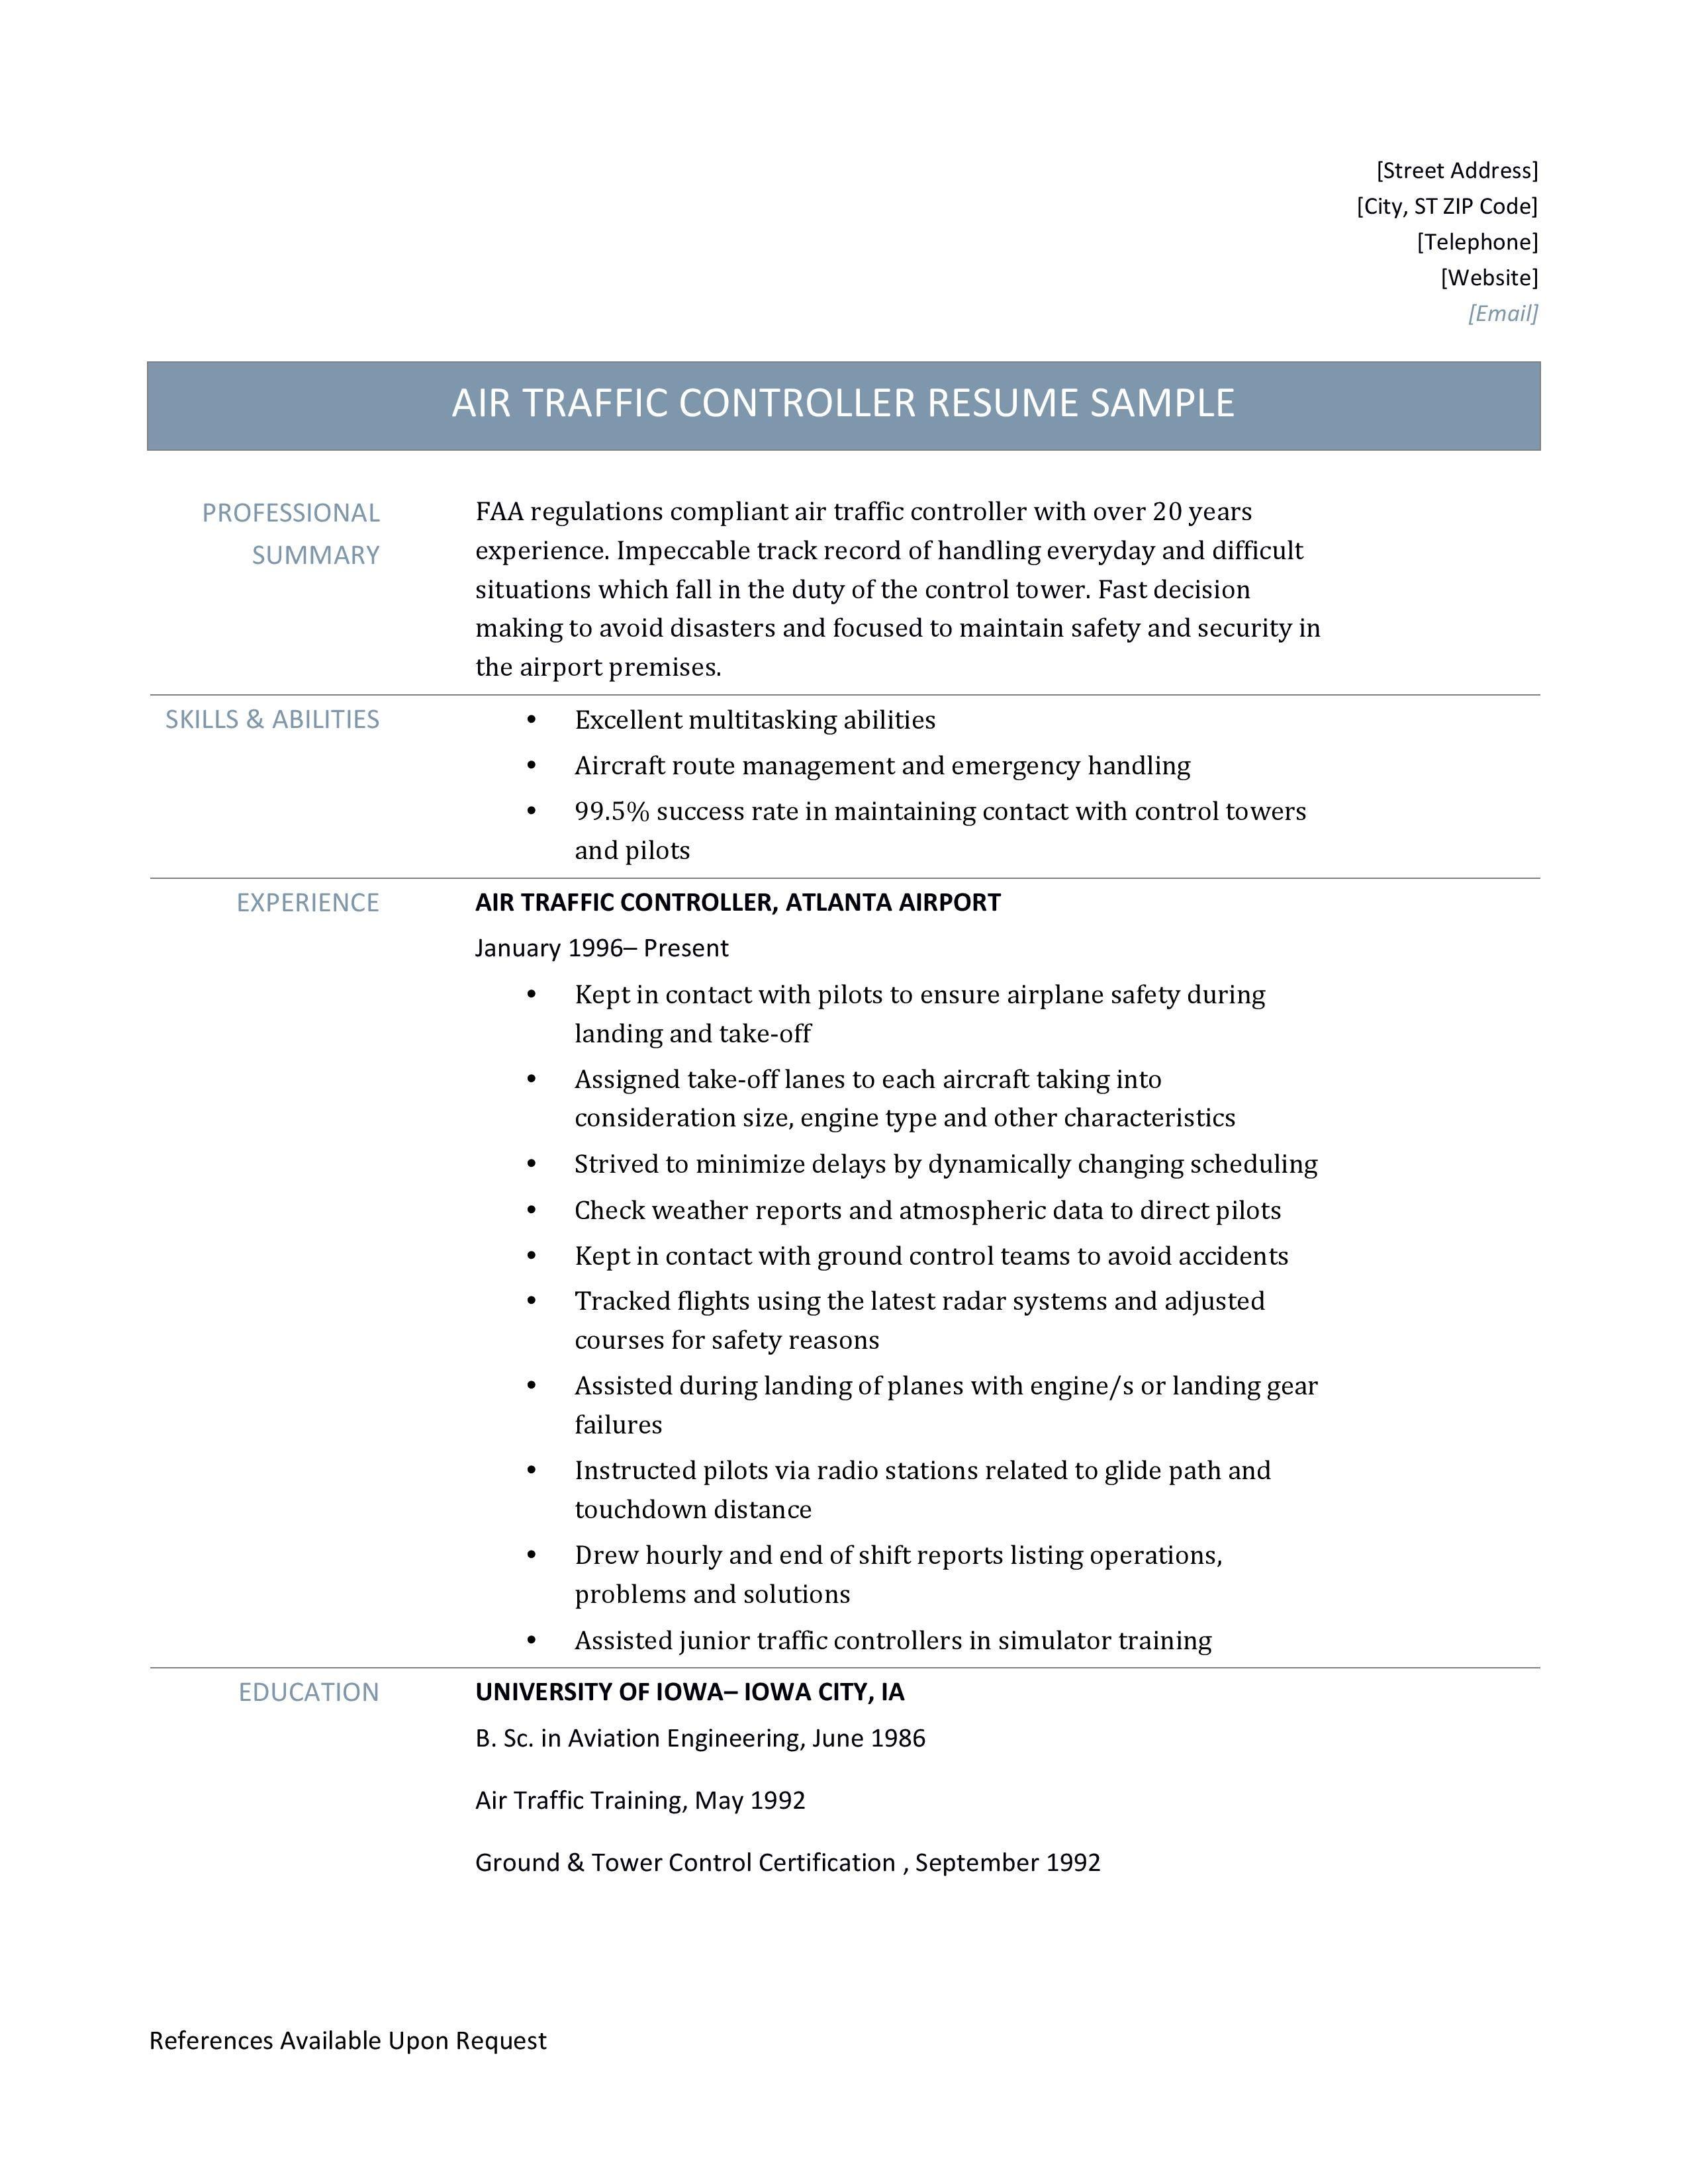 Air Traffic Controller Resume Online Resume Builders Medium